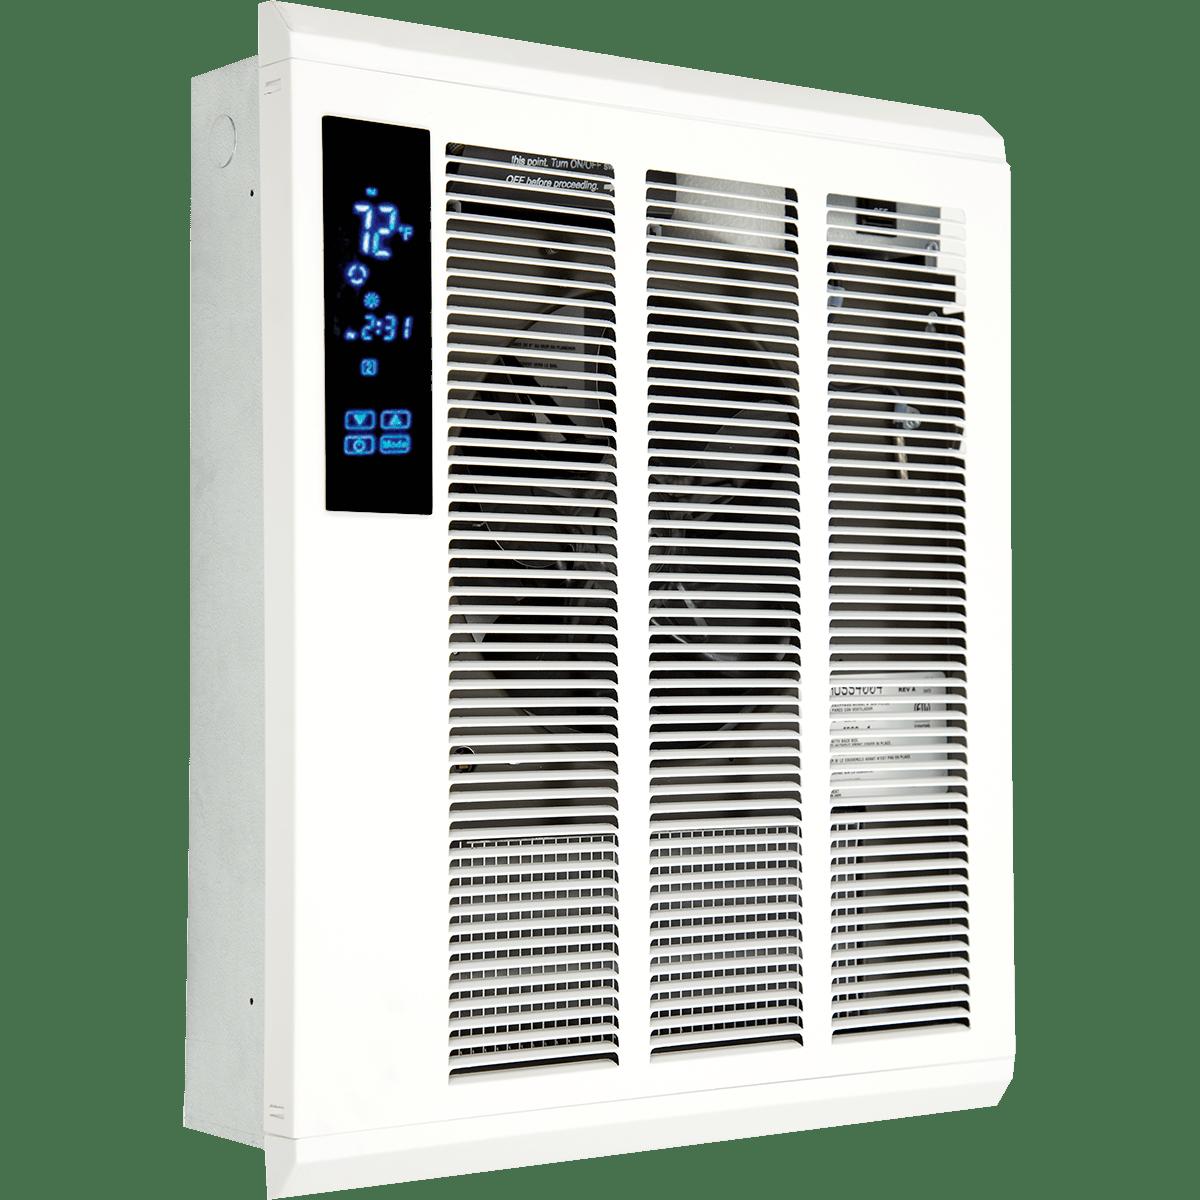 Qmark Wall Heater Photos And Door Wiring Diagram Ssho4004 Smart 240v Sylvane